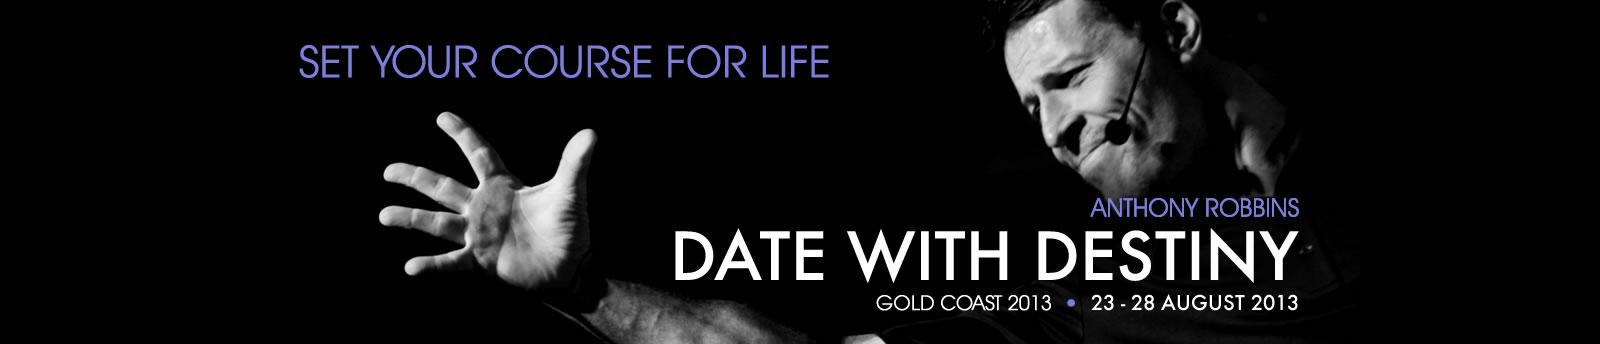 Date with destiny in Brisbane